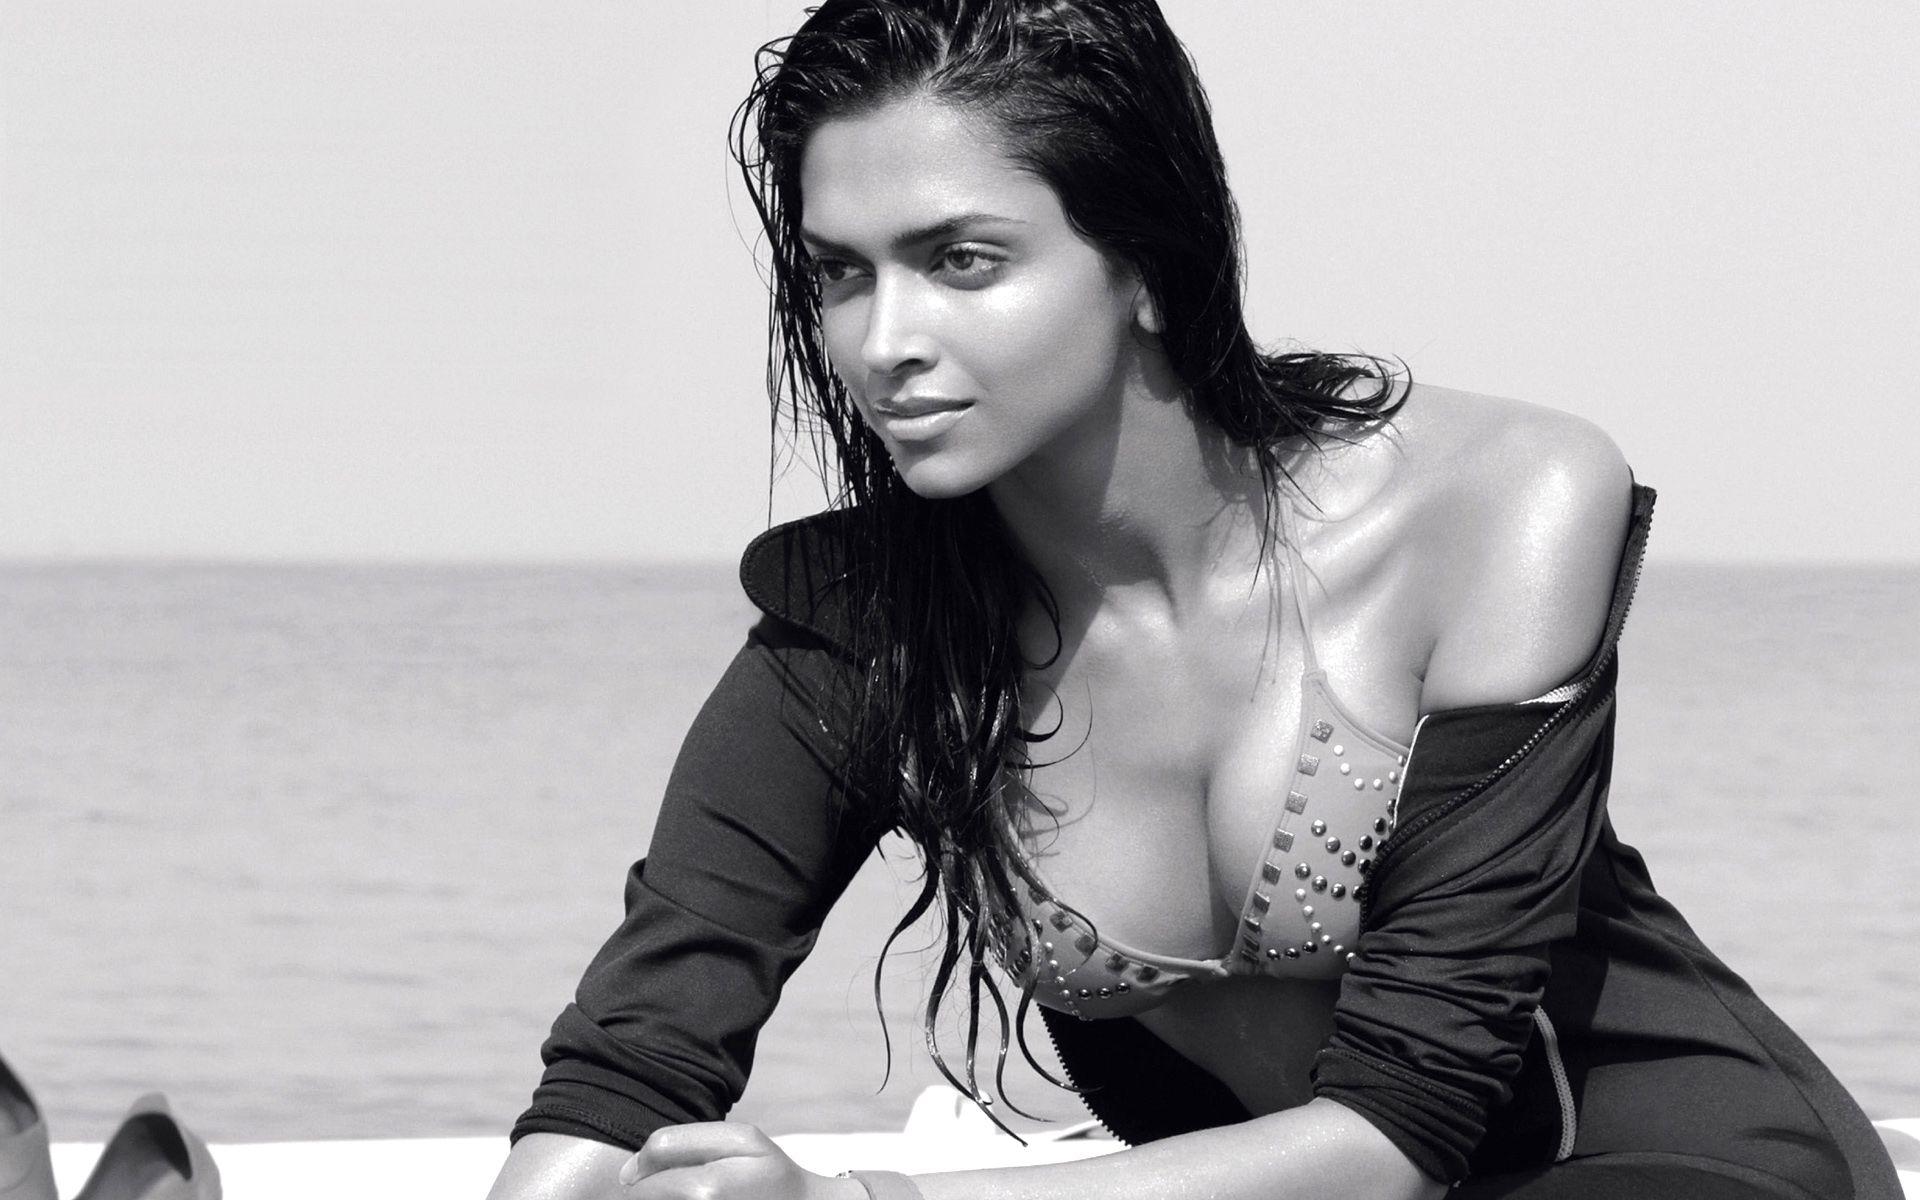 Deepika Padukone Sexiest Bikini Pictures